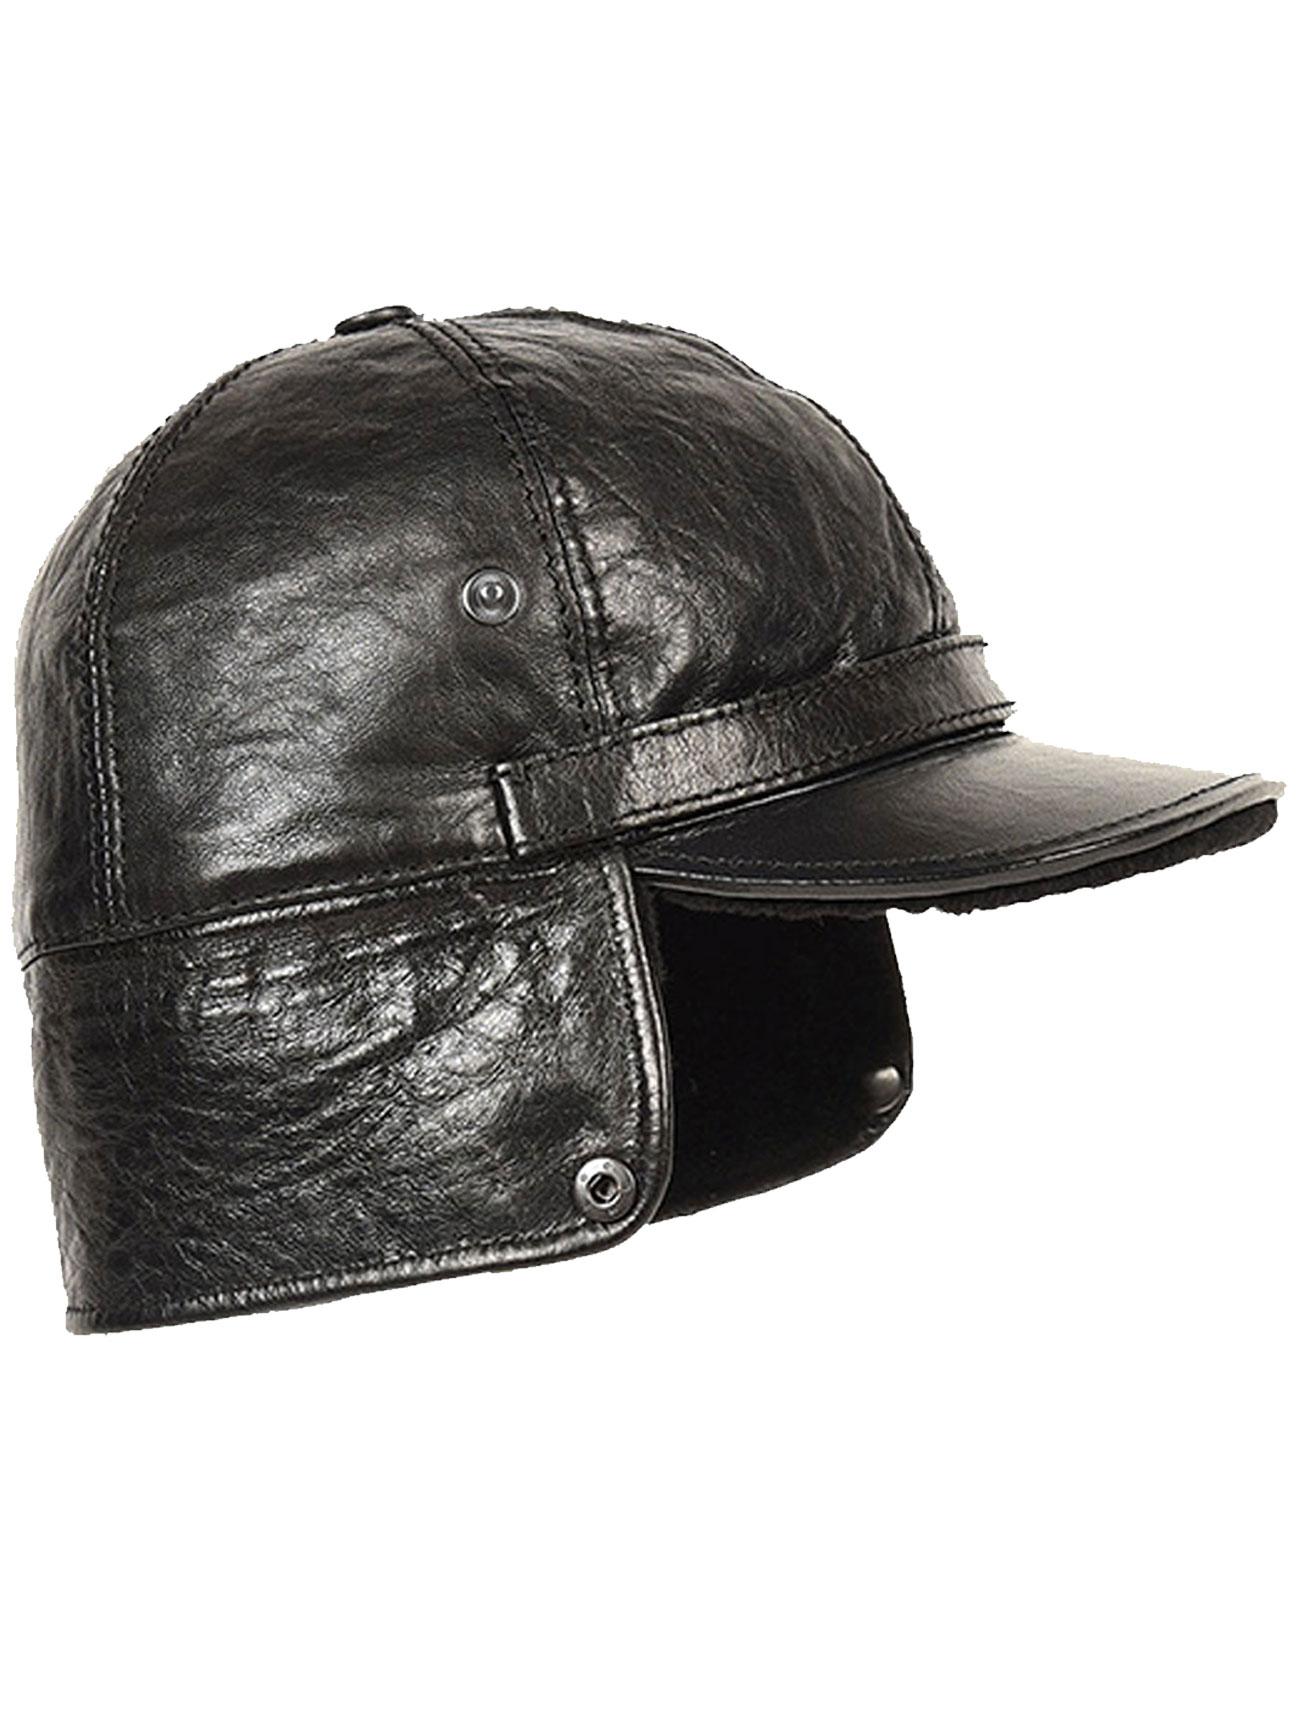 2945f3fd1e2481 Rio Lambskin Hat